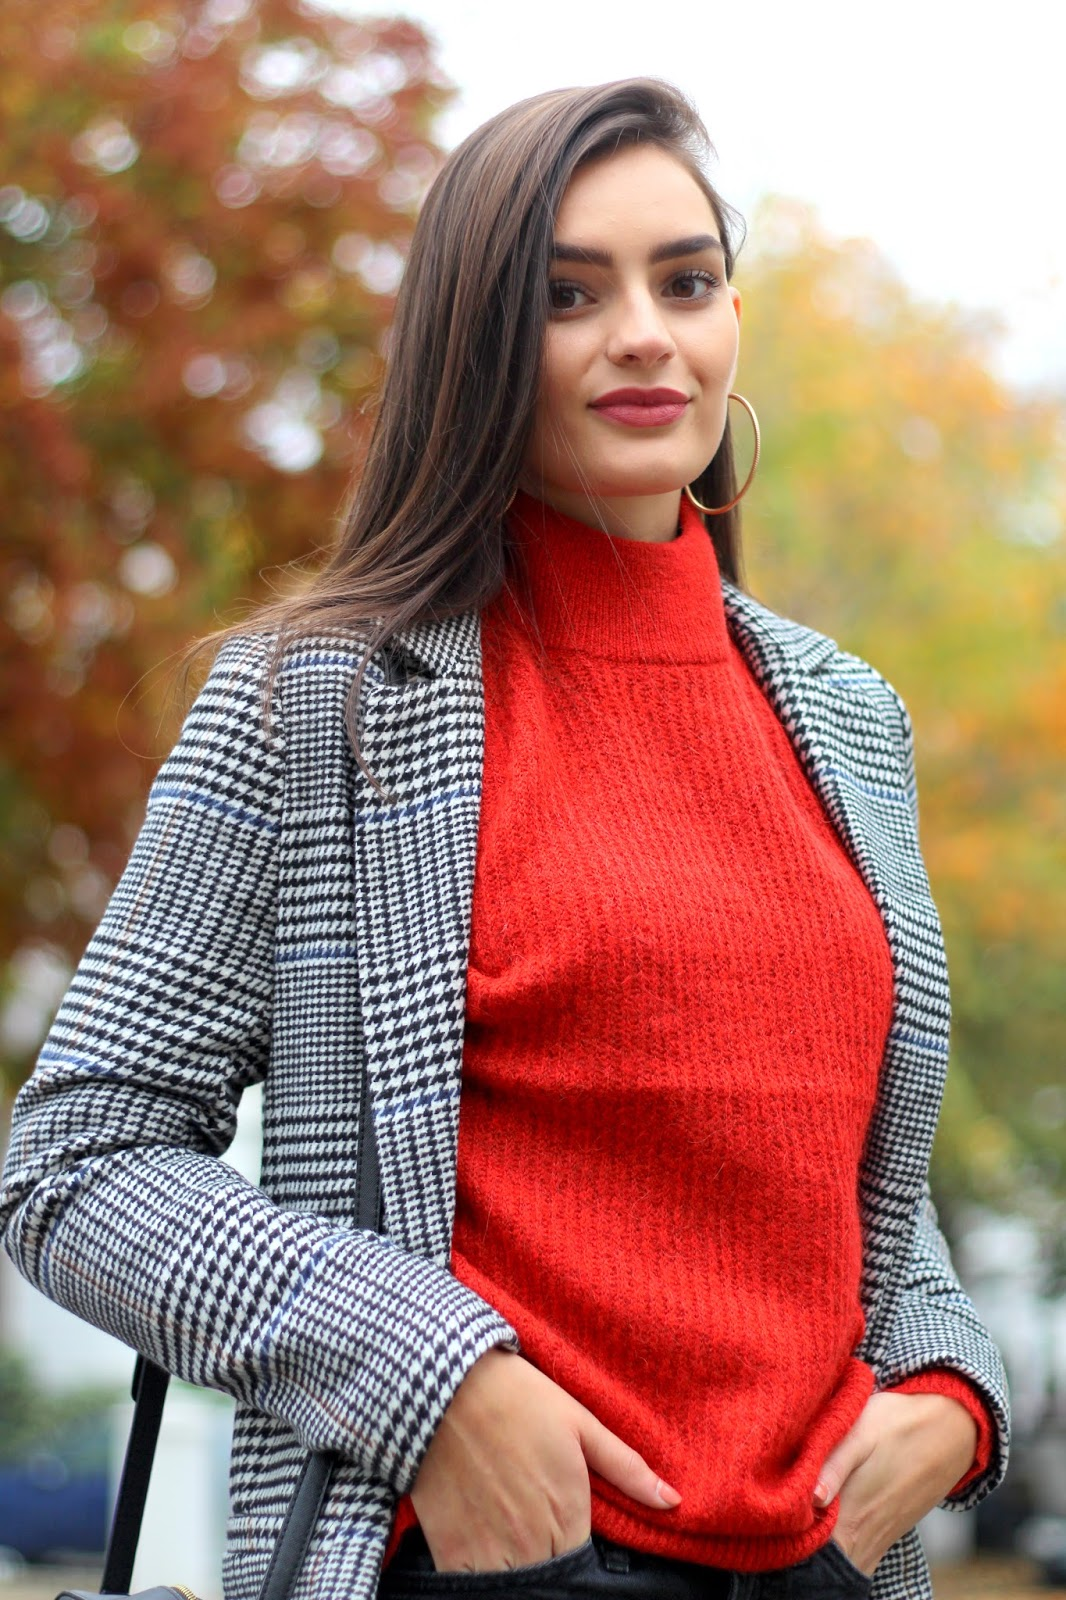 fashion blogger peexo autumn coat weather